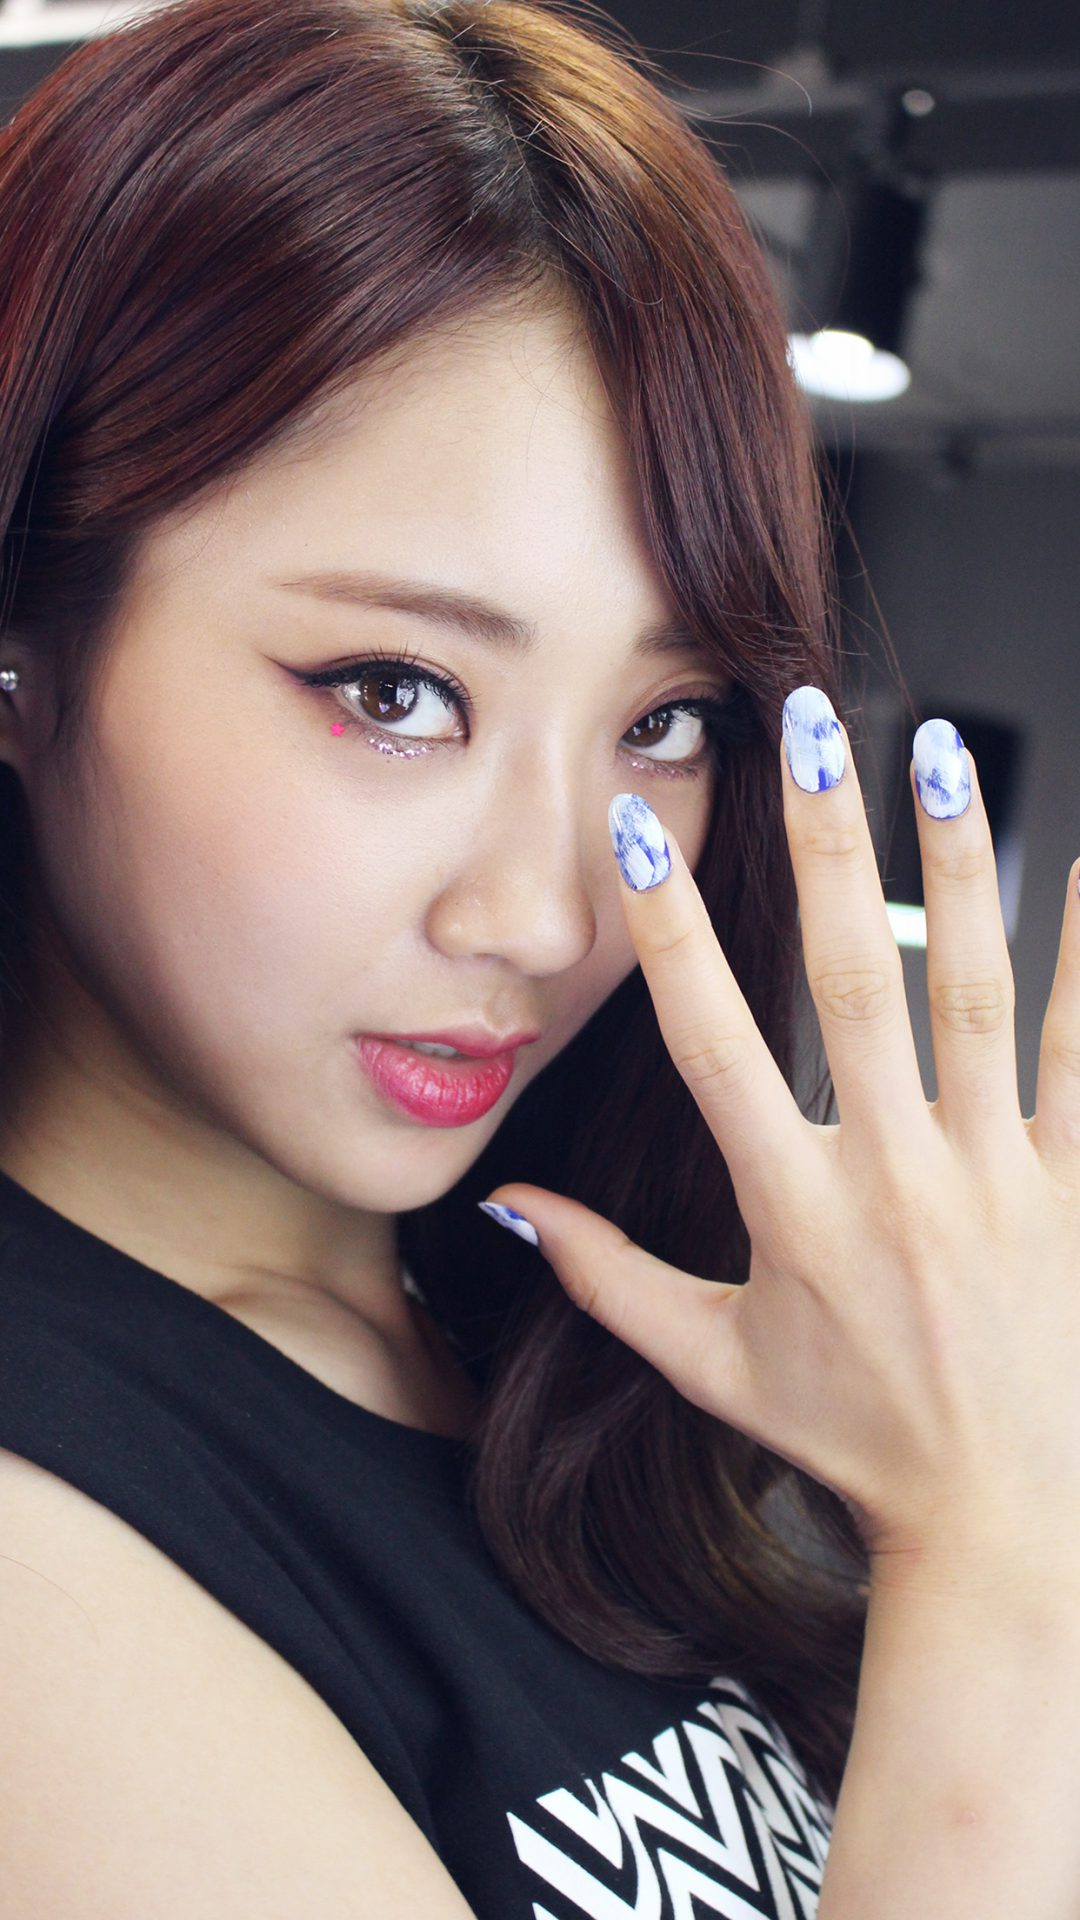 Kyungli Kpop Girl Nail Cute